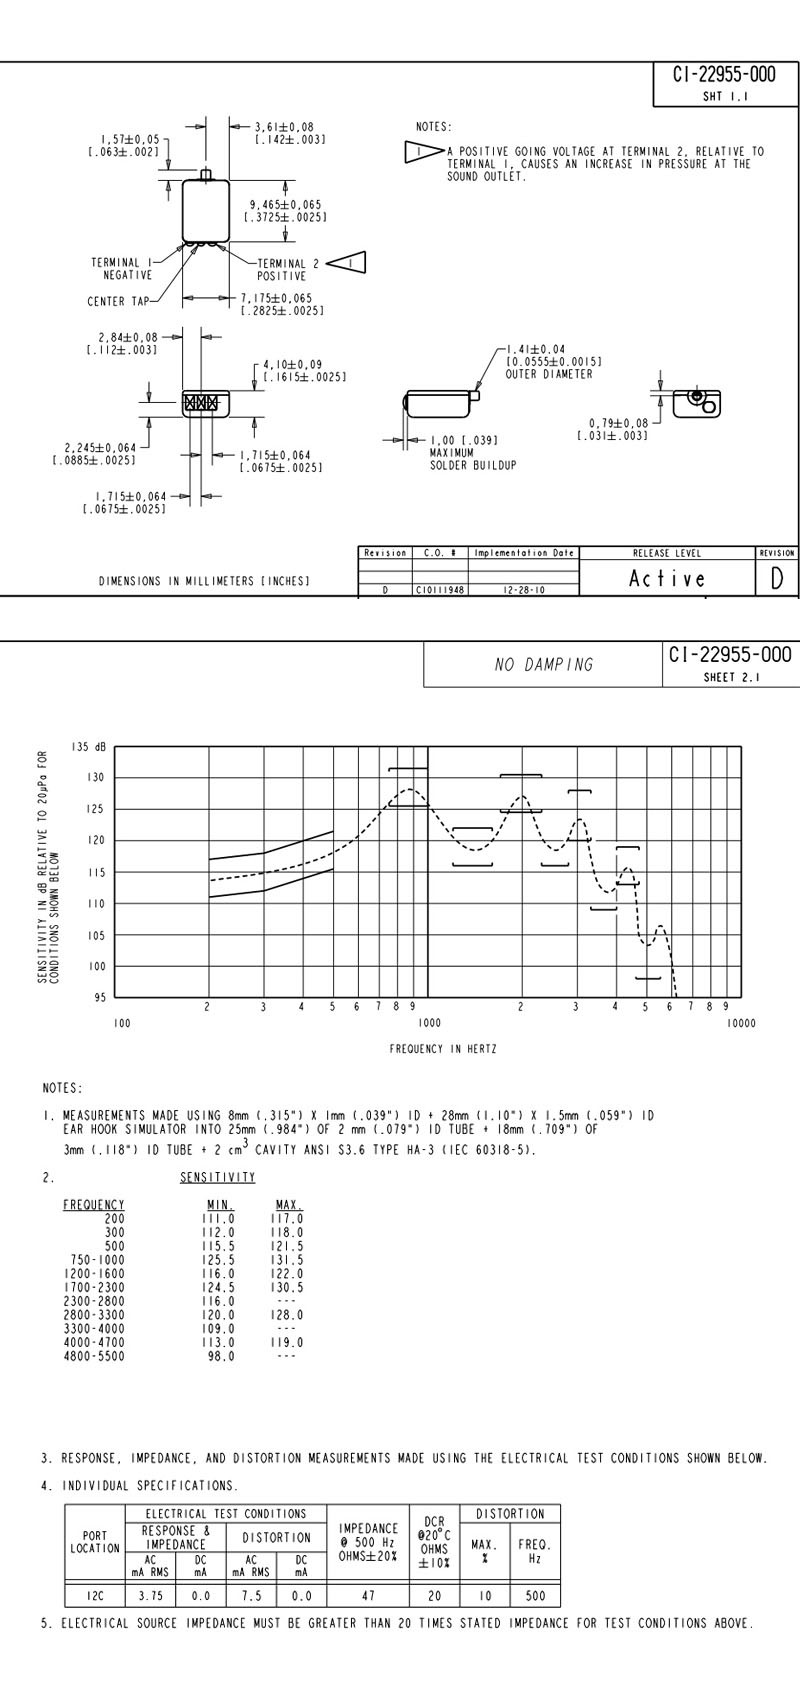 Knowles receiver CI-22955